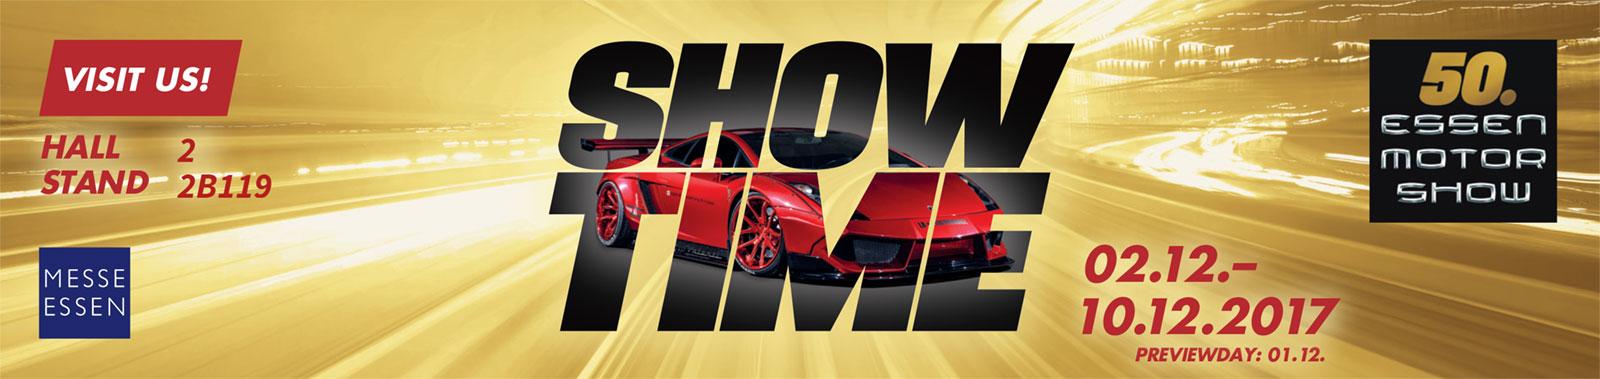 Visit us at the Essen Motorshow